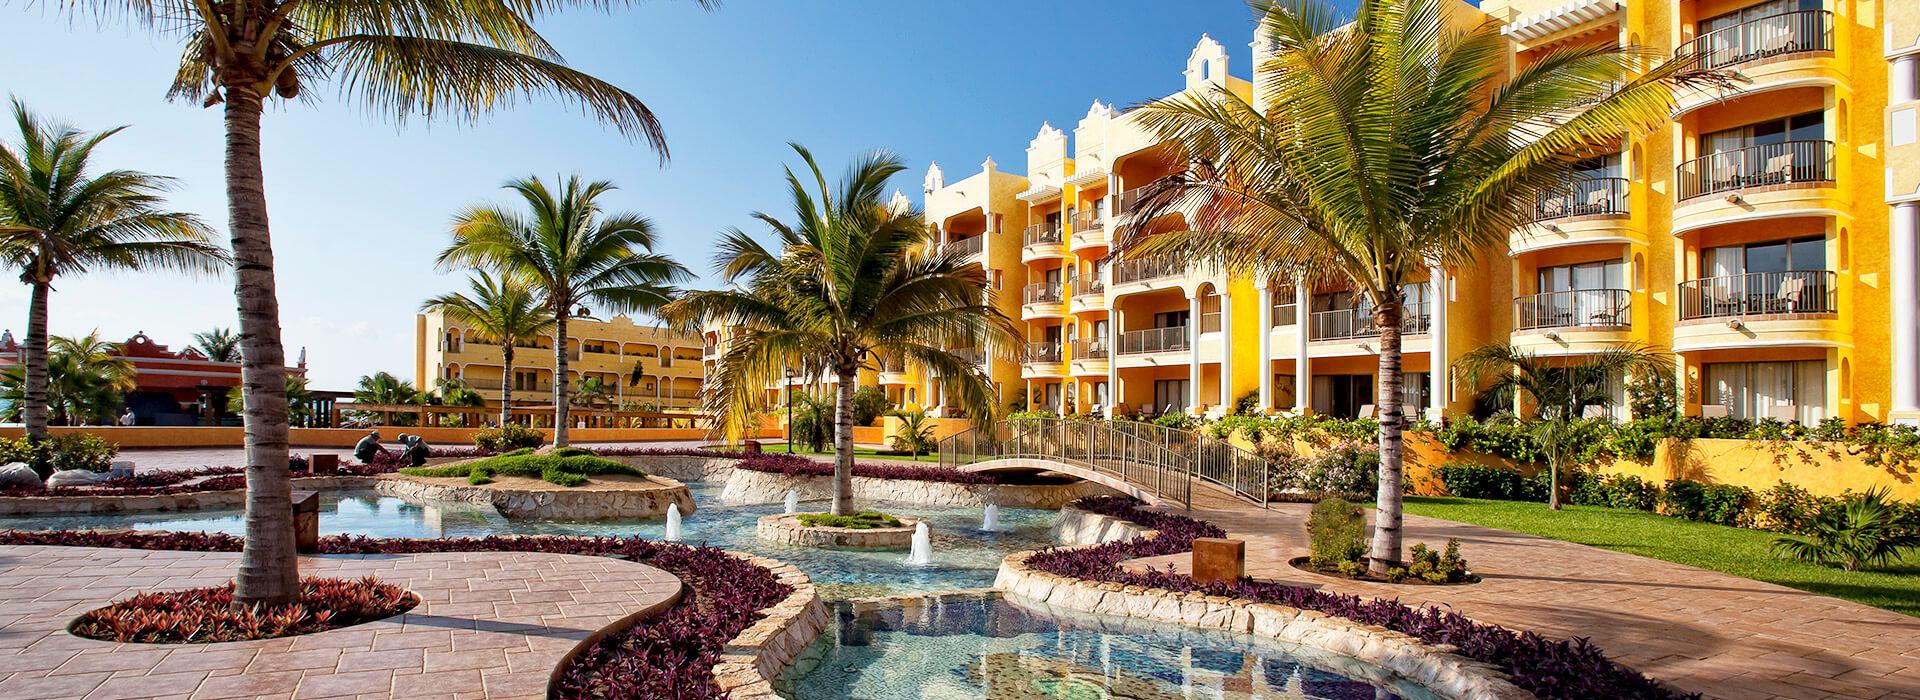 The Royal Haciendas all inclusive Resort in Playa del Carmen